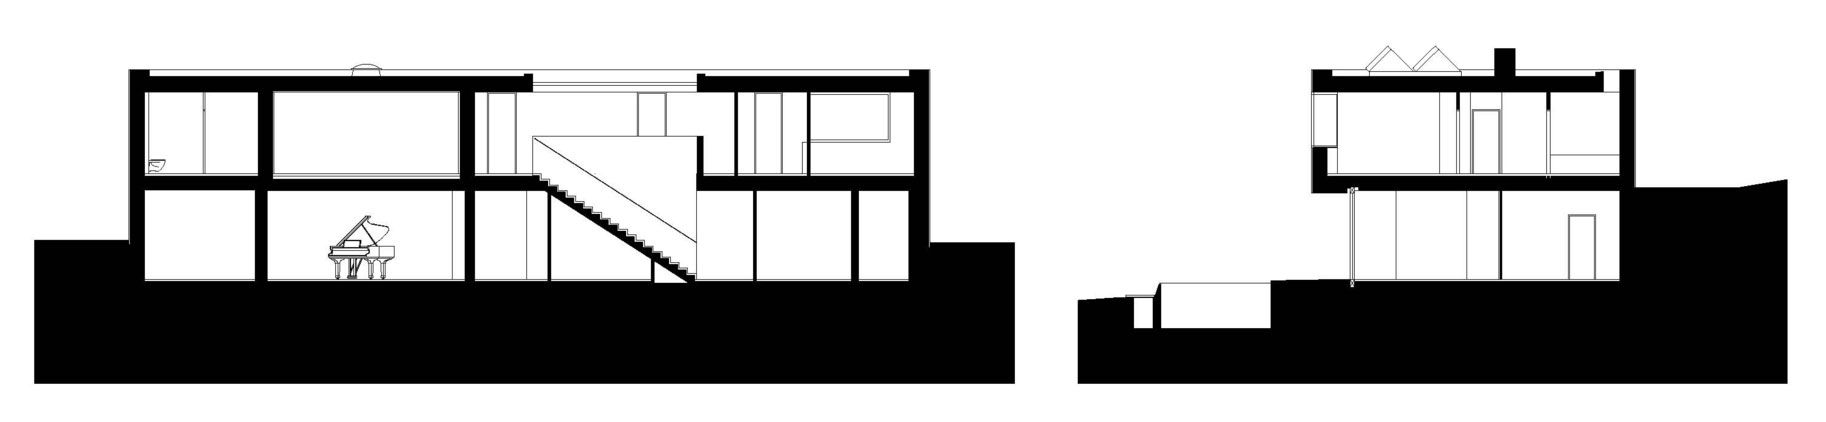 House-L-13